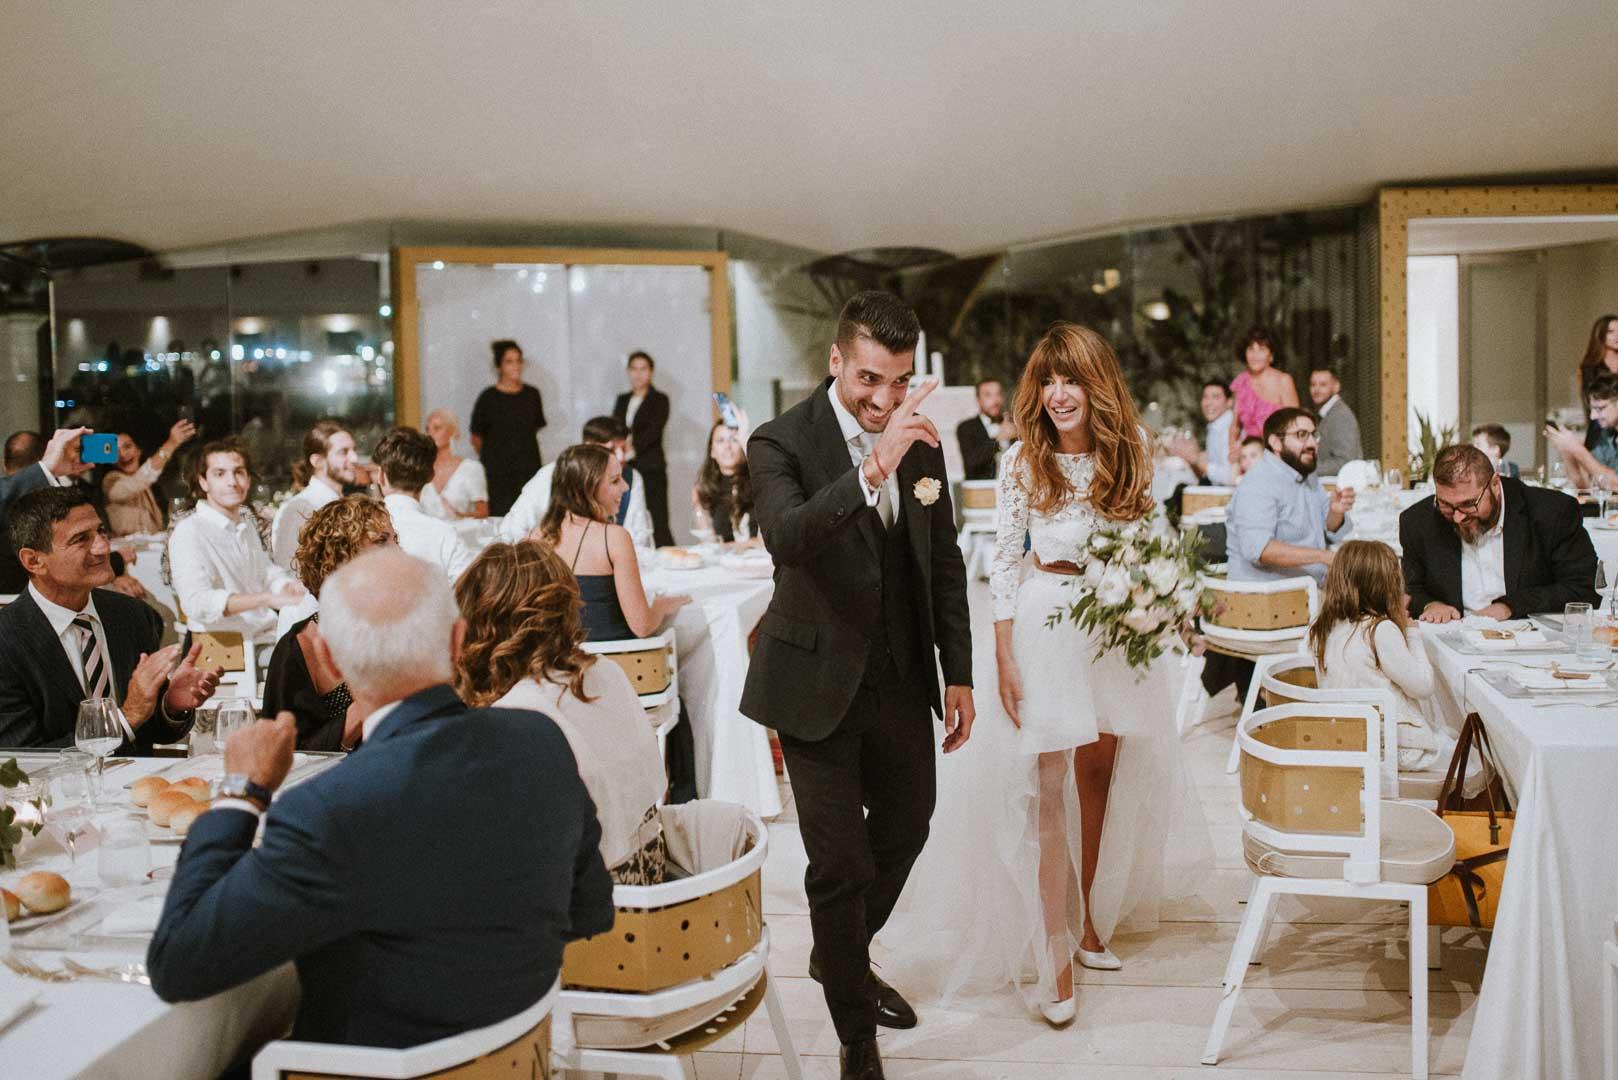 wedding-photographer-destination-fineart-bespoke-reportage-napoli-nabilah-vivianeizzo-spazio46-172